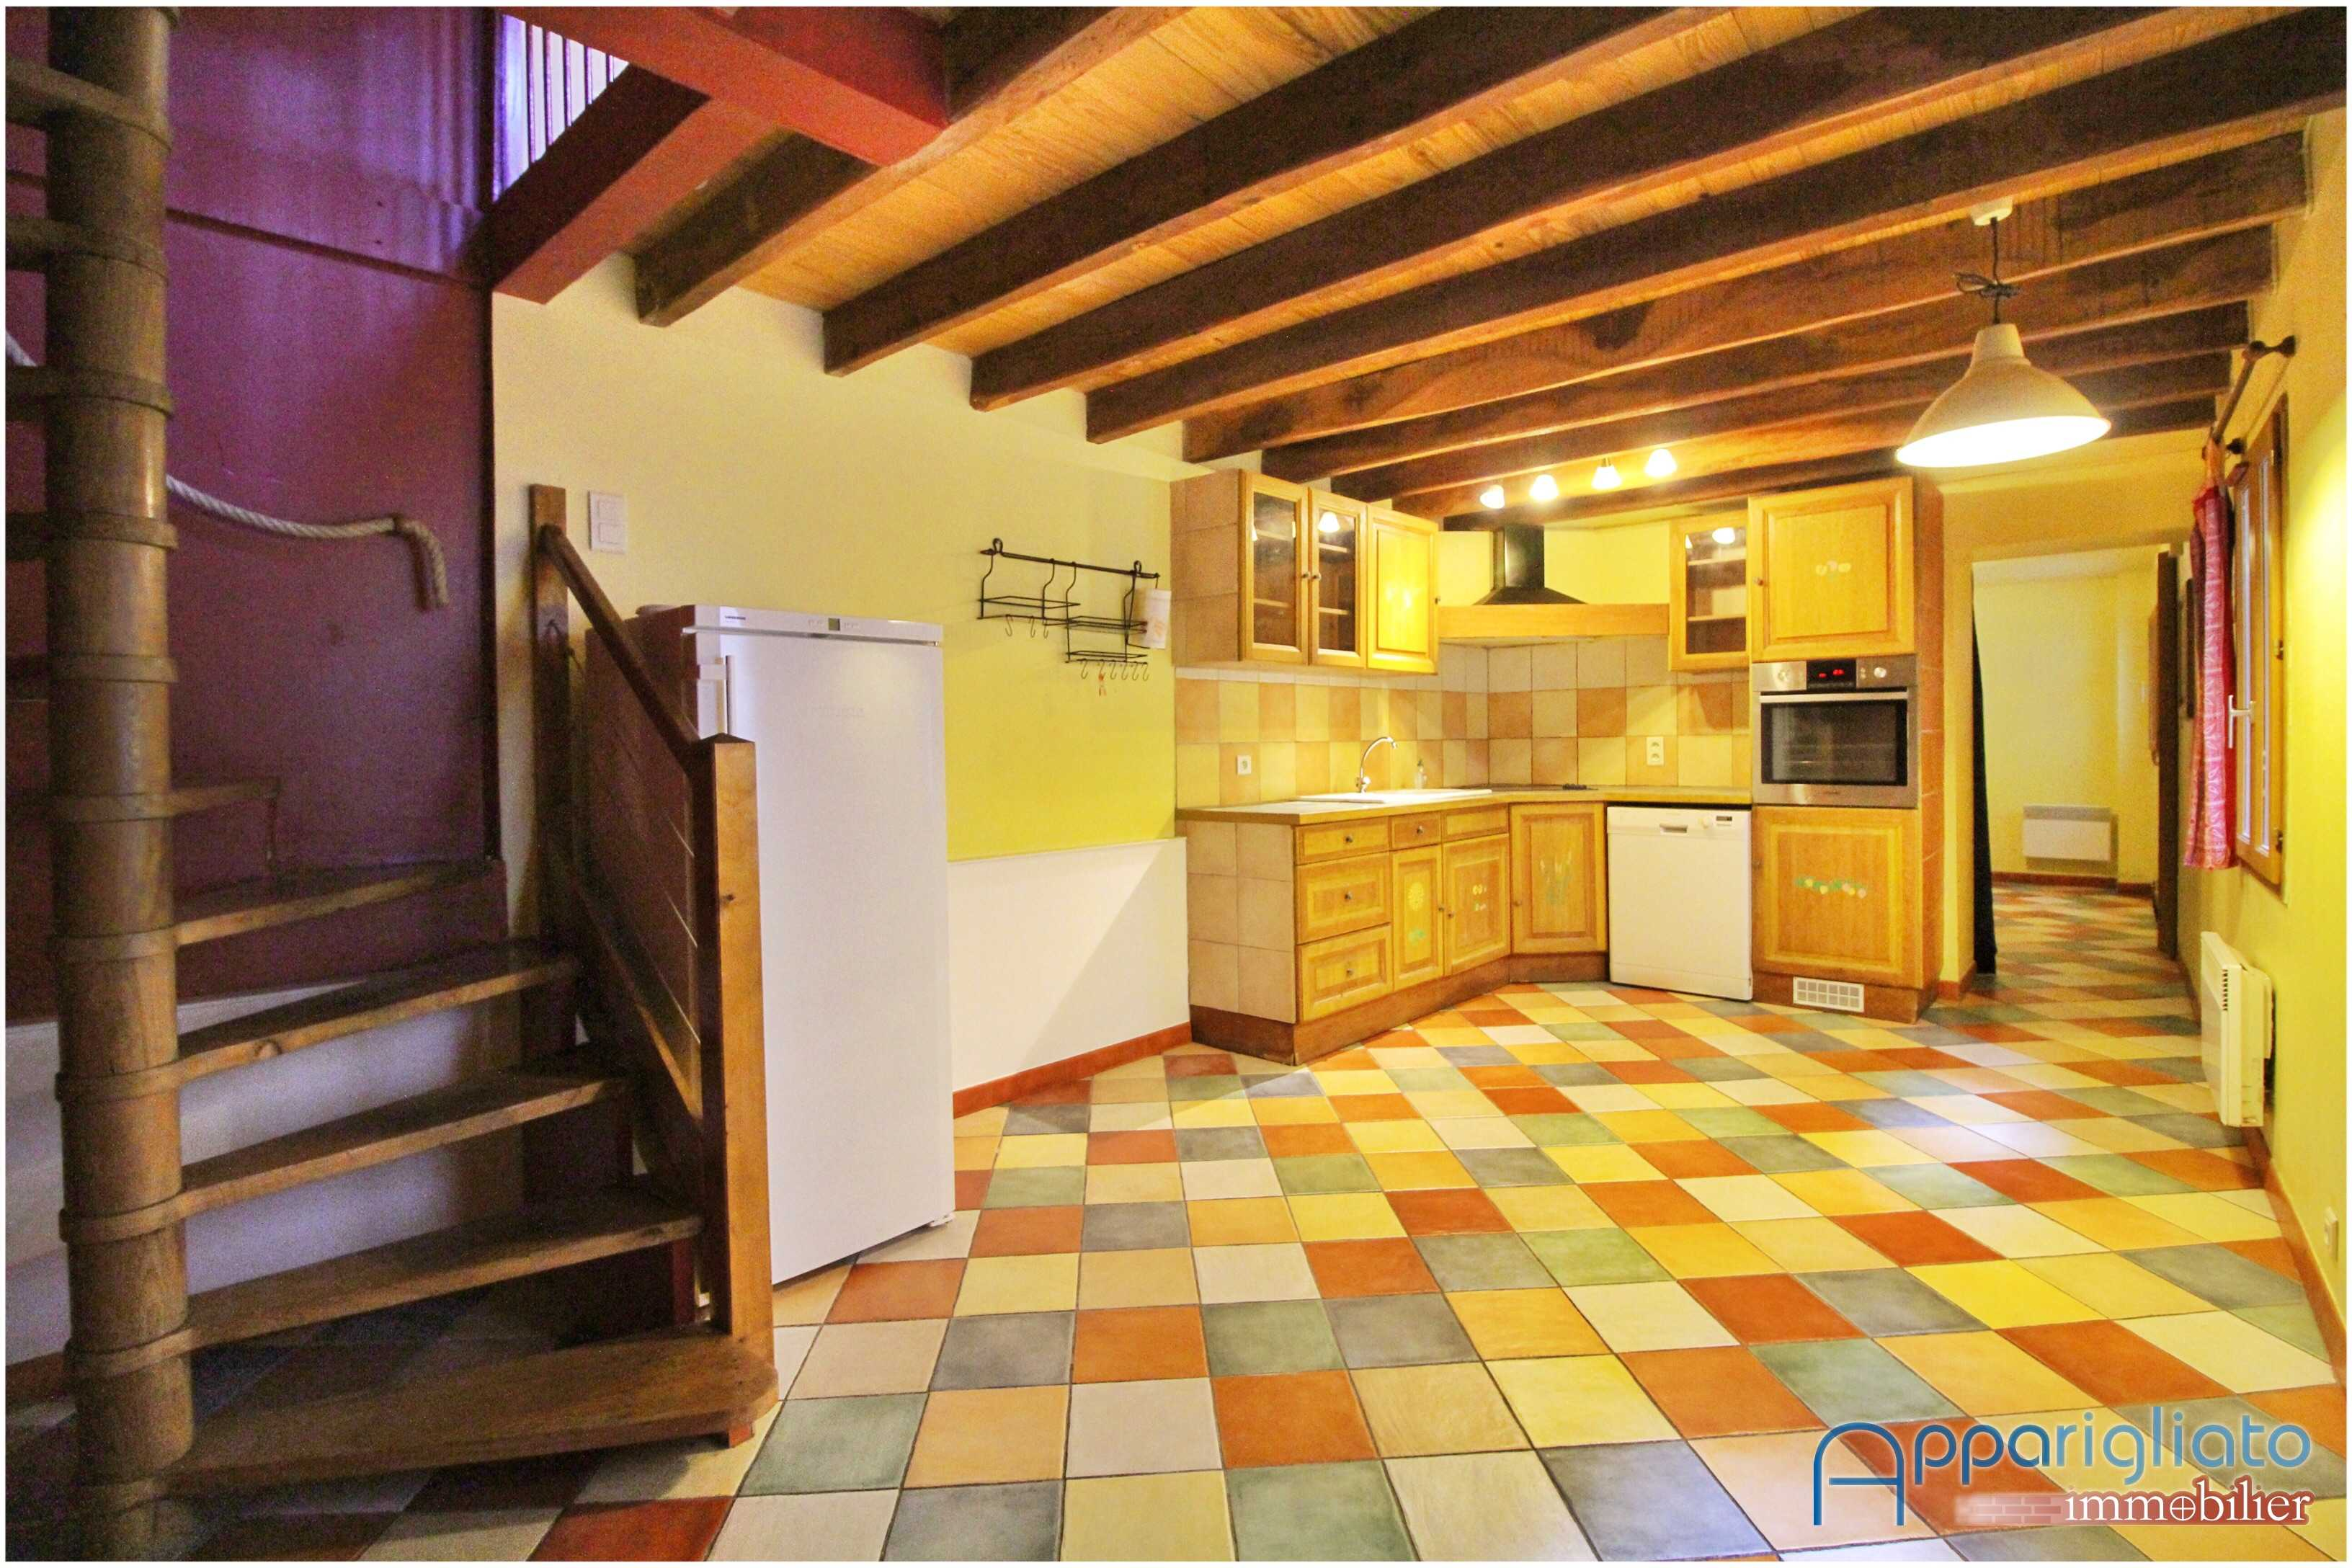 la maison du carrelage balma great balma carrelage carrelage balma beige with la maison du. Black Bedroom Furniture Sets. Home Design Ideas